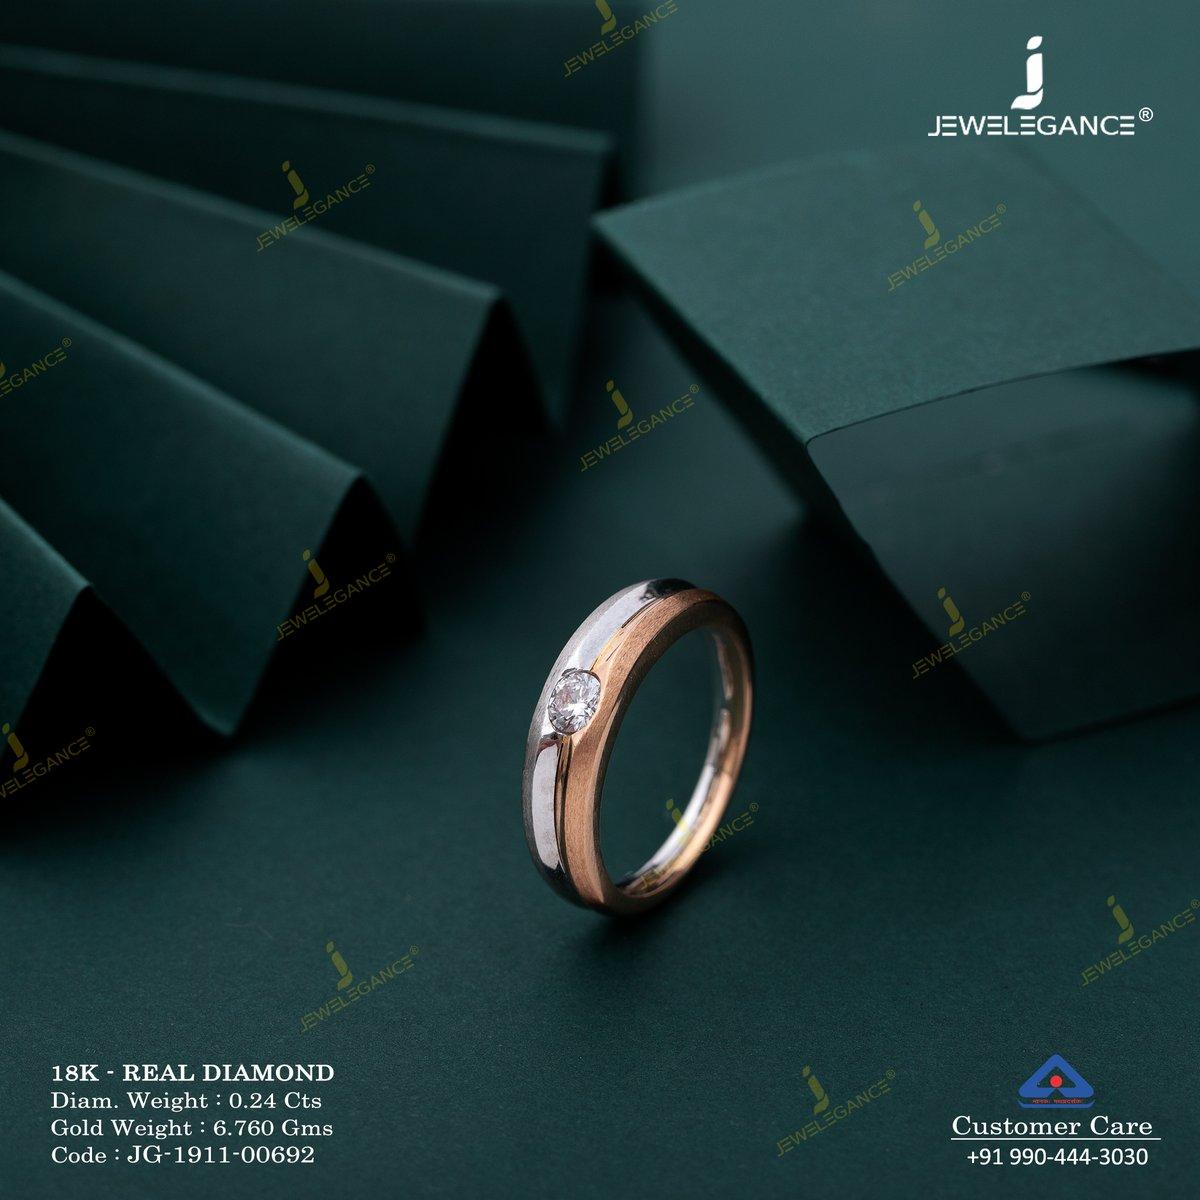 Make your love shine as diamond... . #Shop on: https://www.jewelegance.com/product-detail/3383… . #myjewelegance #goldjewellery #jewellery  #ring #goldring #engagementring #lastesttrend #ringoftheday #diamondring #lovefordiamonds #mensfashion #mensjewellerypic.twitter.com/rdD1Qr8JjD